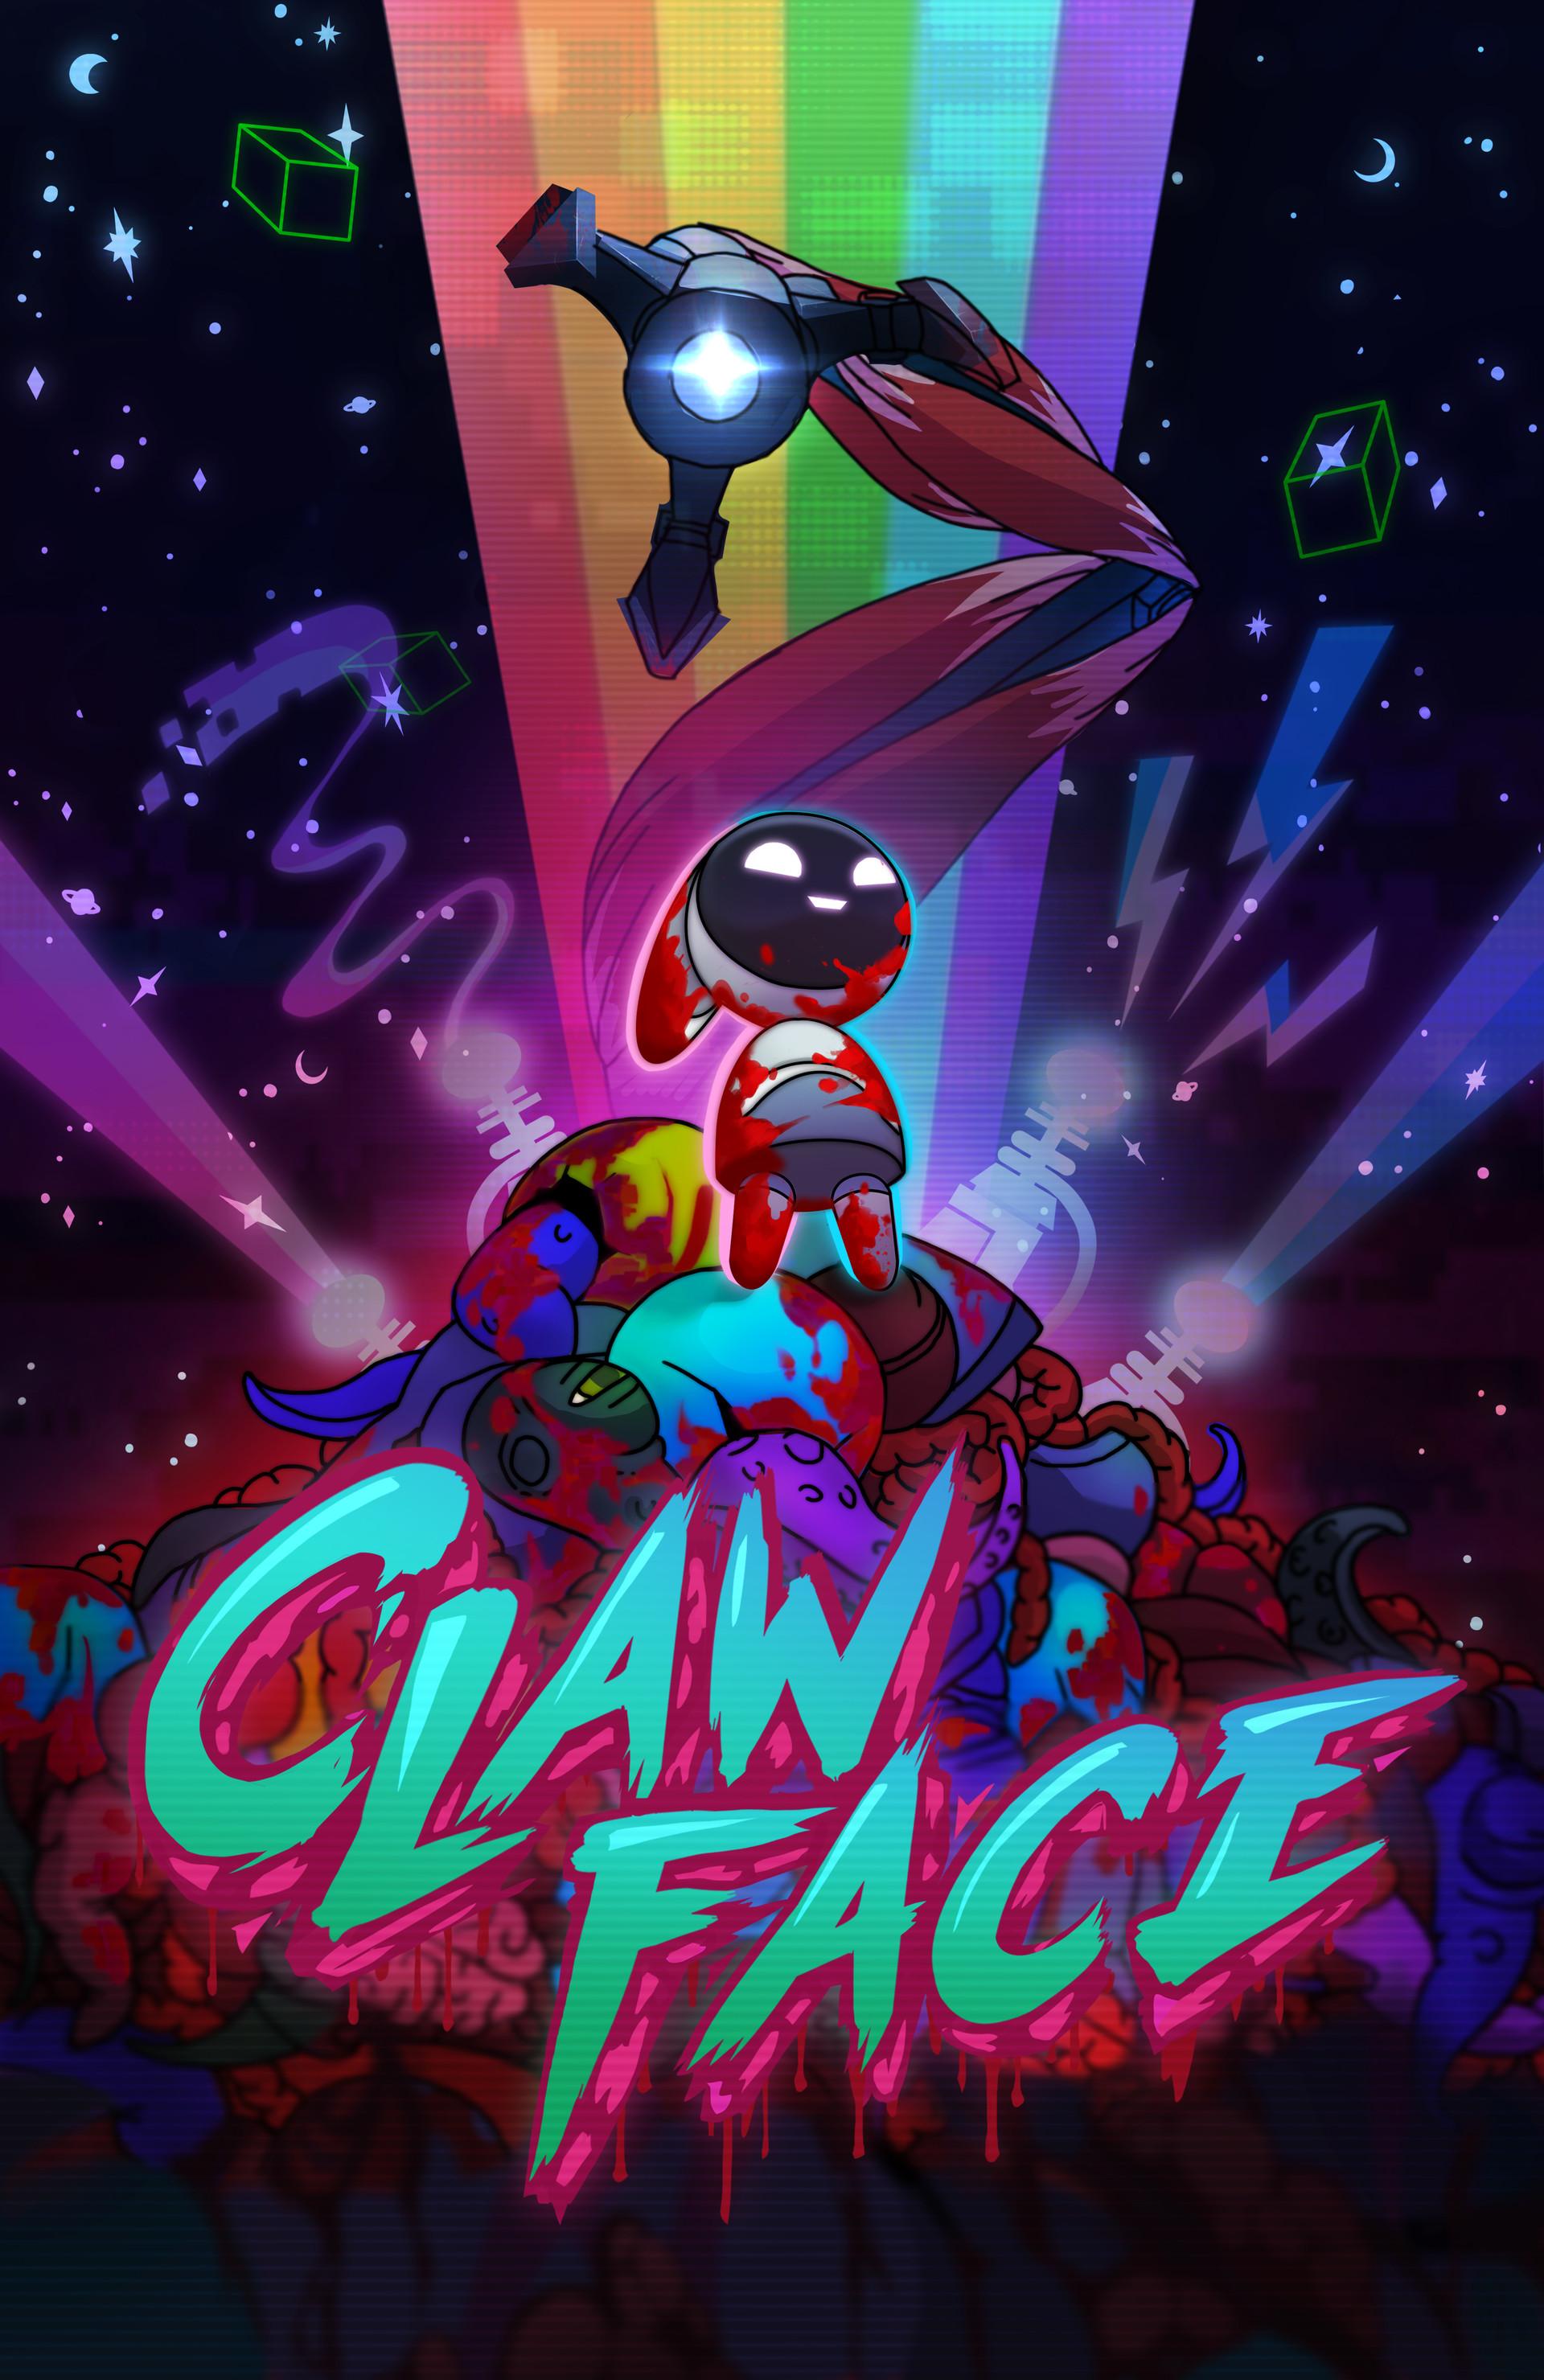 Cherlin mao poster clawface6